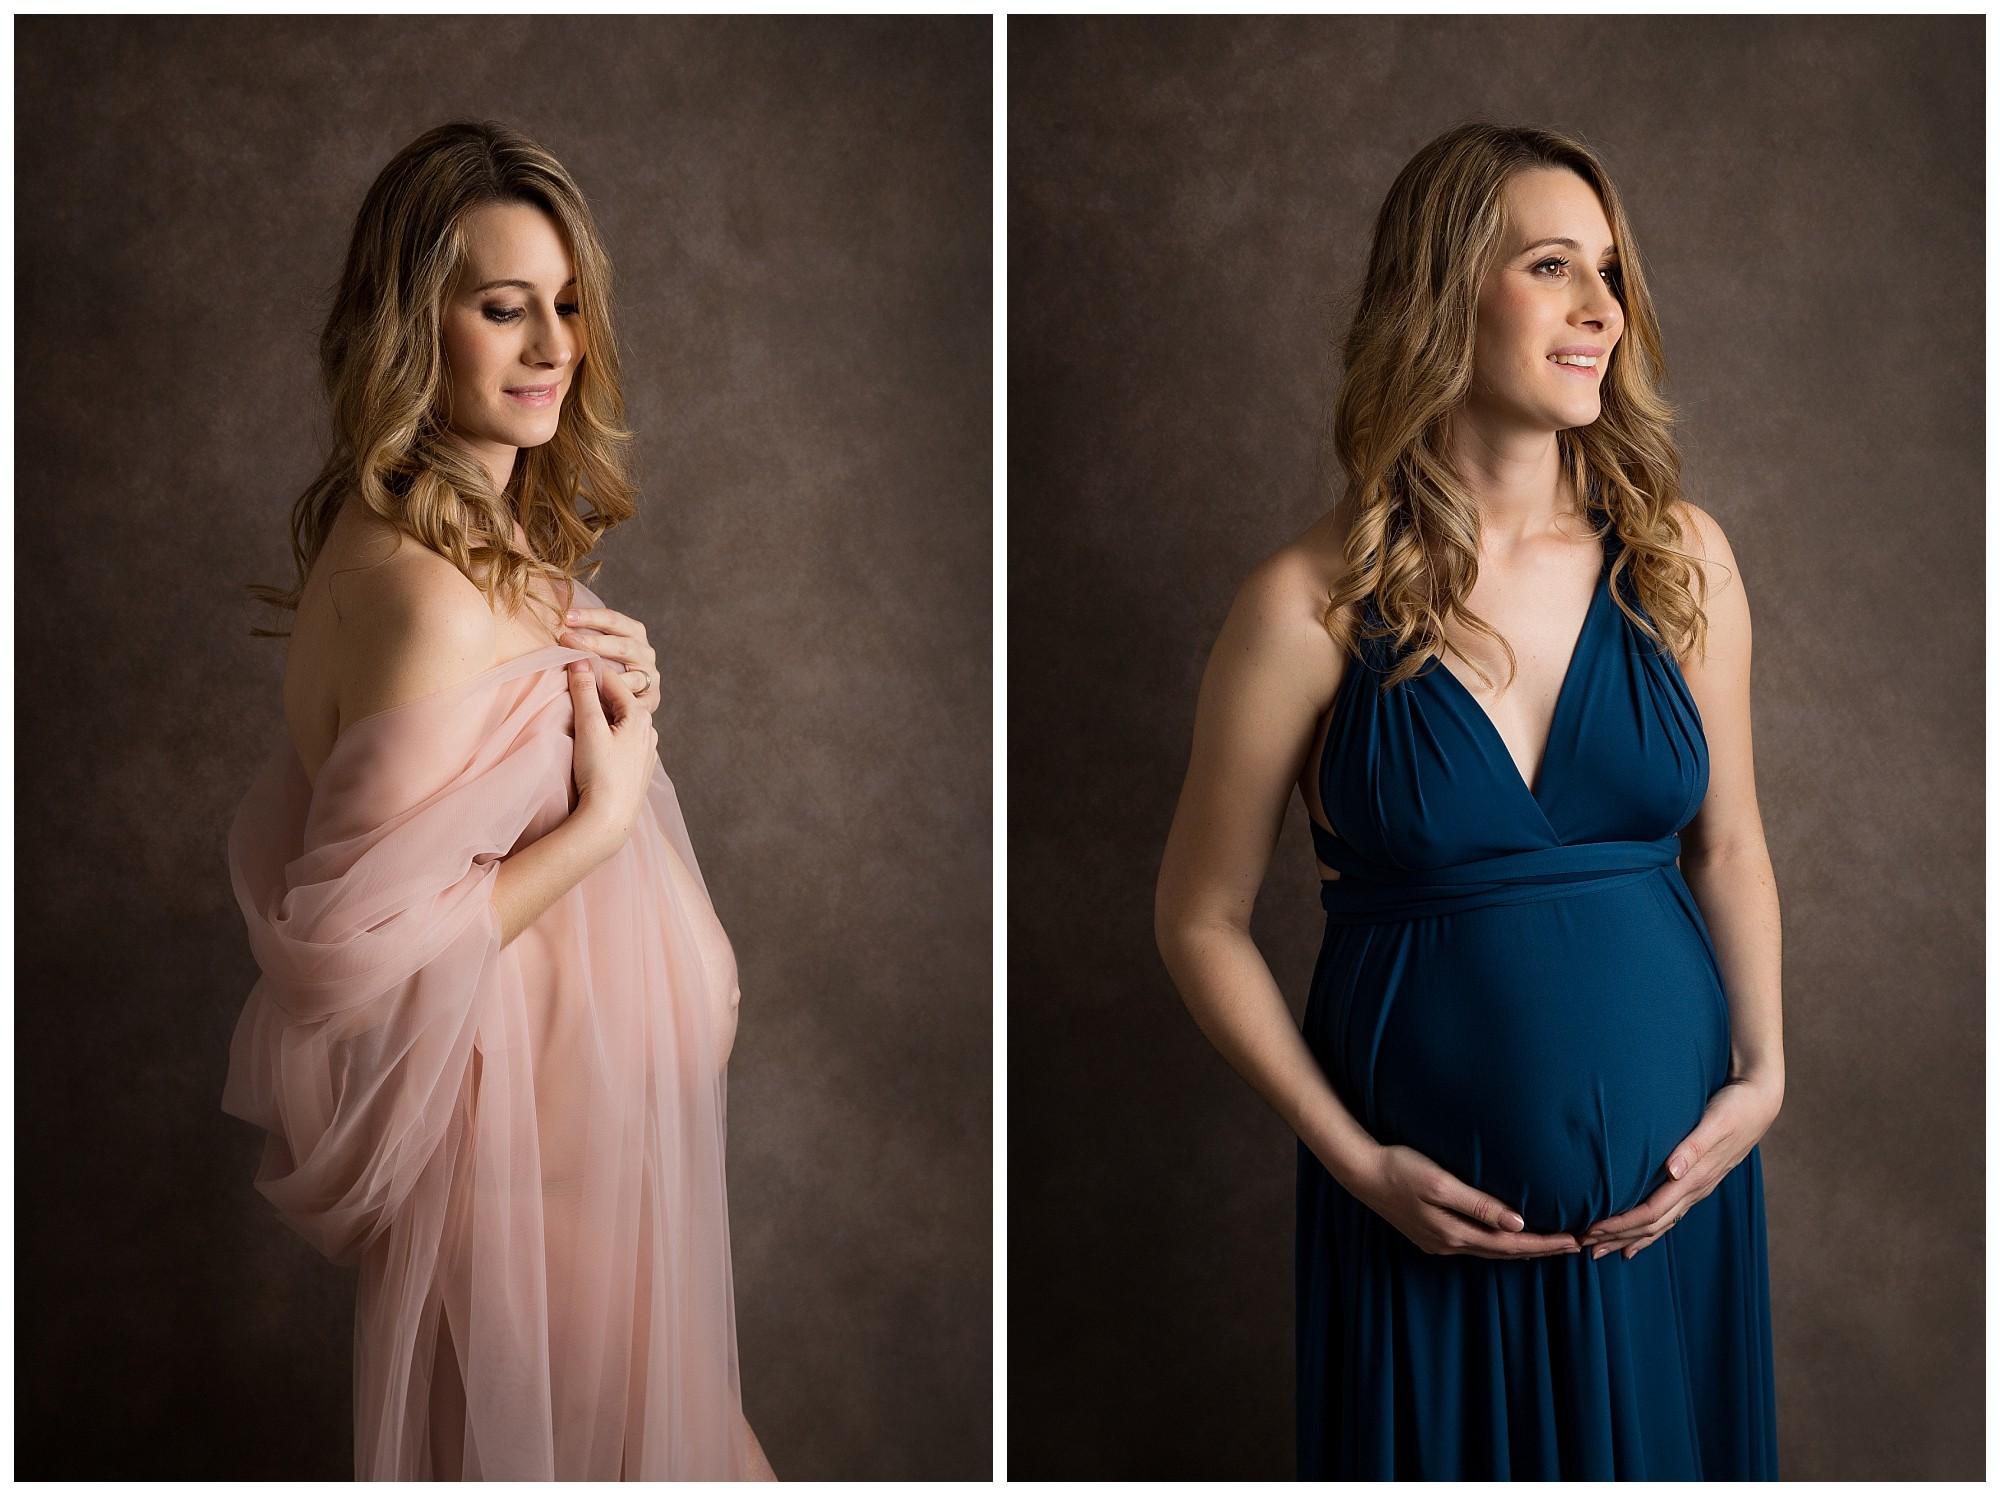 seance-photo-future-maman-artistique-robe-voile-yvelines